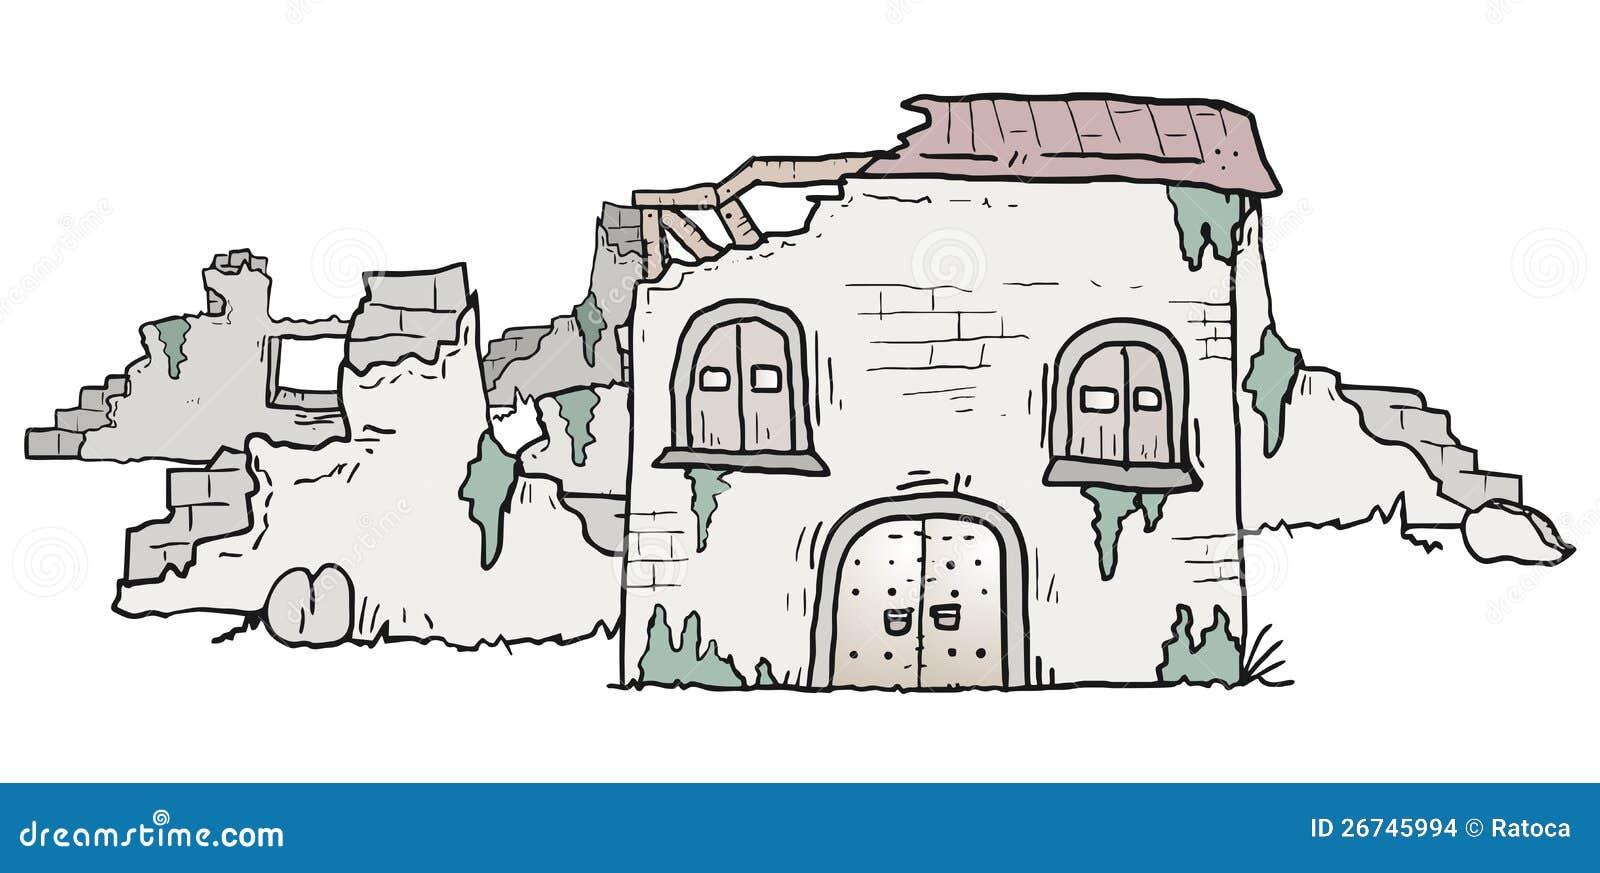 Maison En Ruine Dessin ruins house stock vector. illustration of original, house